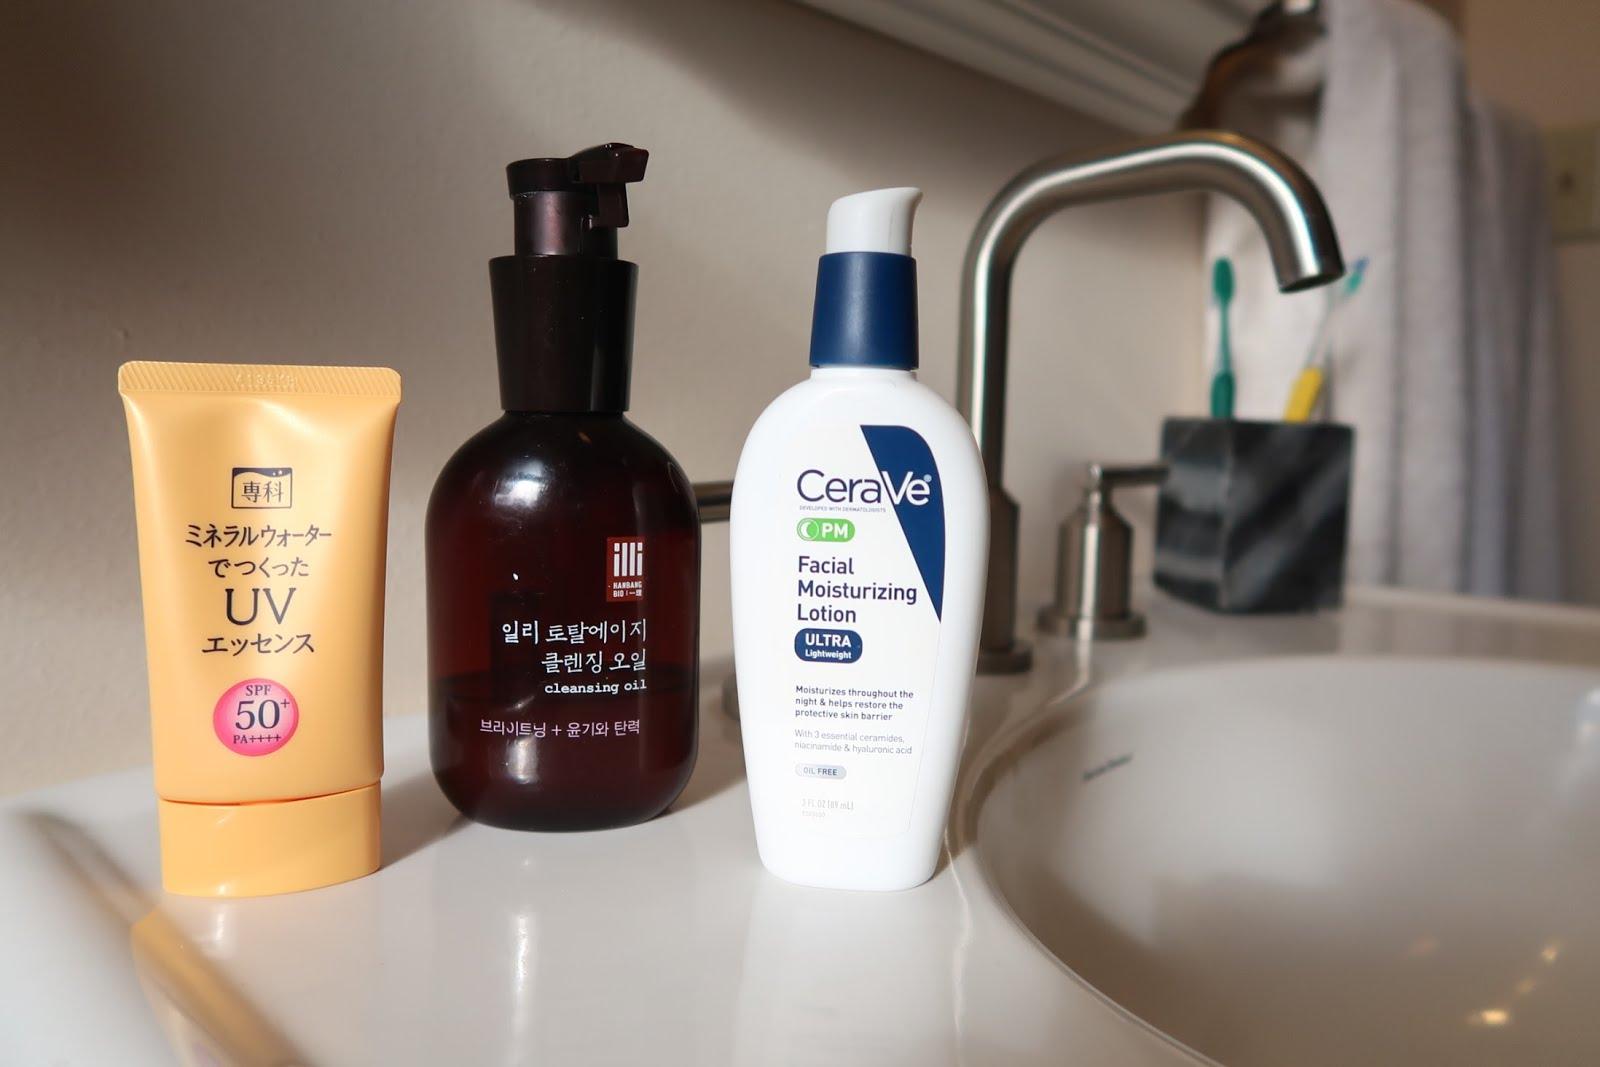 korean skincare beauty cleanser oil first sunscreen sunblock sink white moisturizer